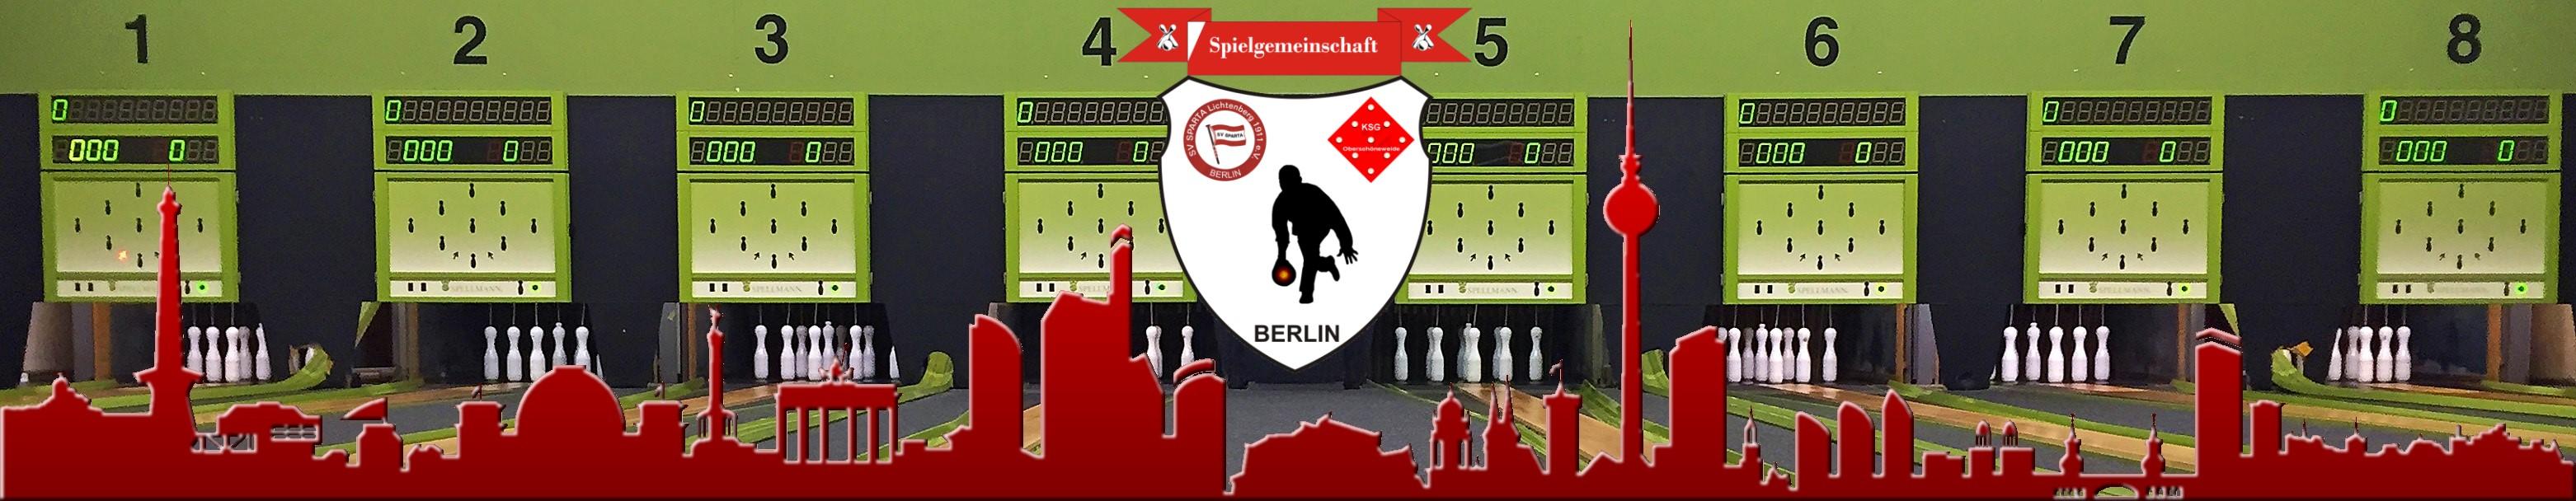 SV Sparta Lichtenberg 1911 e.V. - Abteilung Kegeln